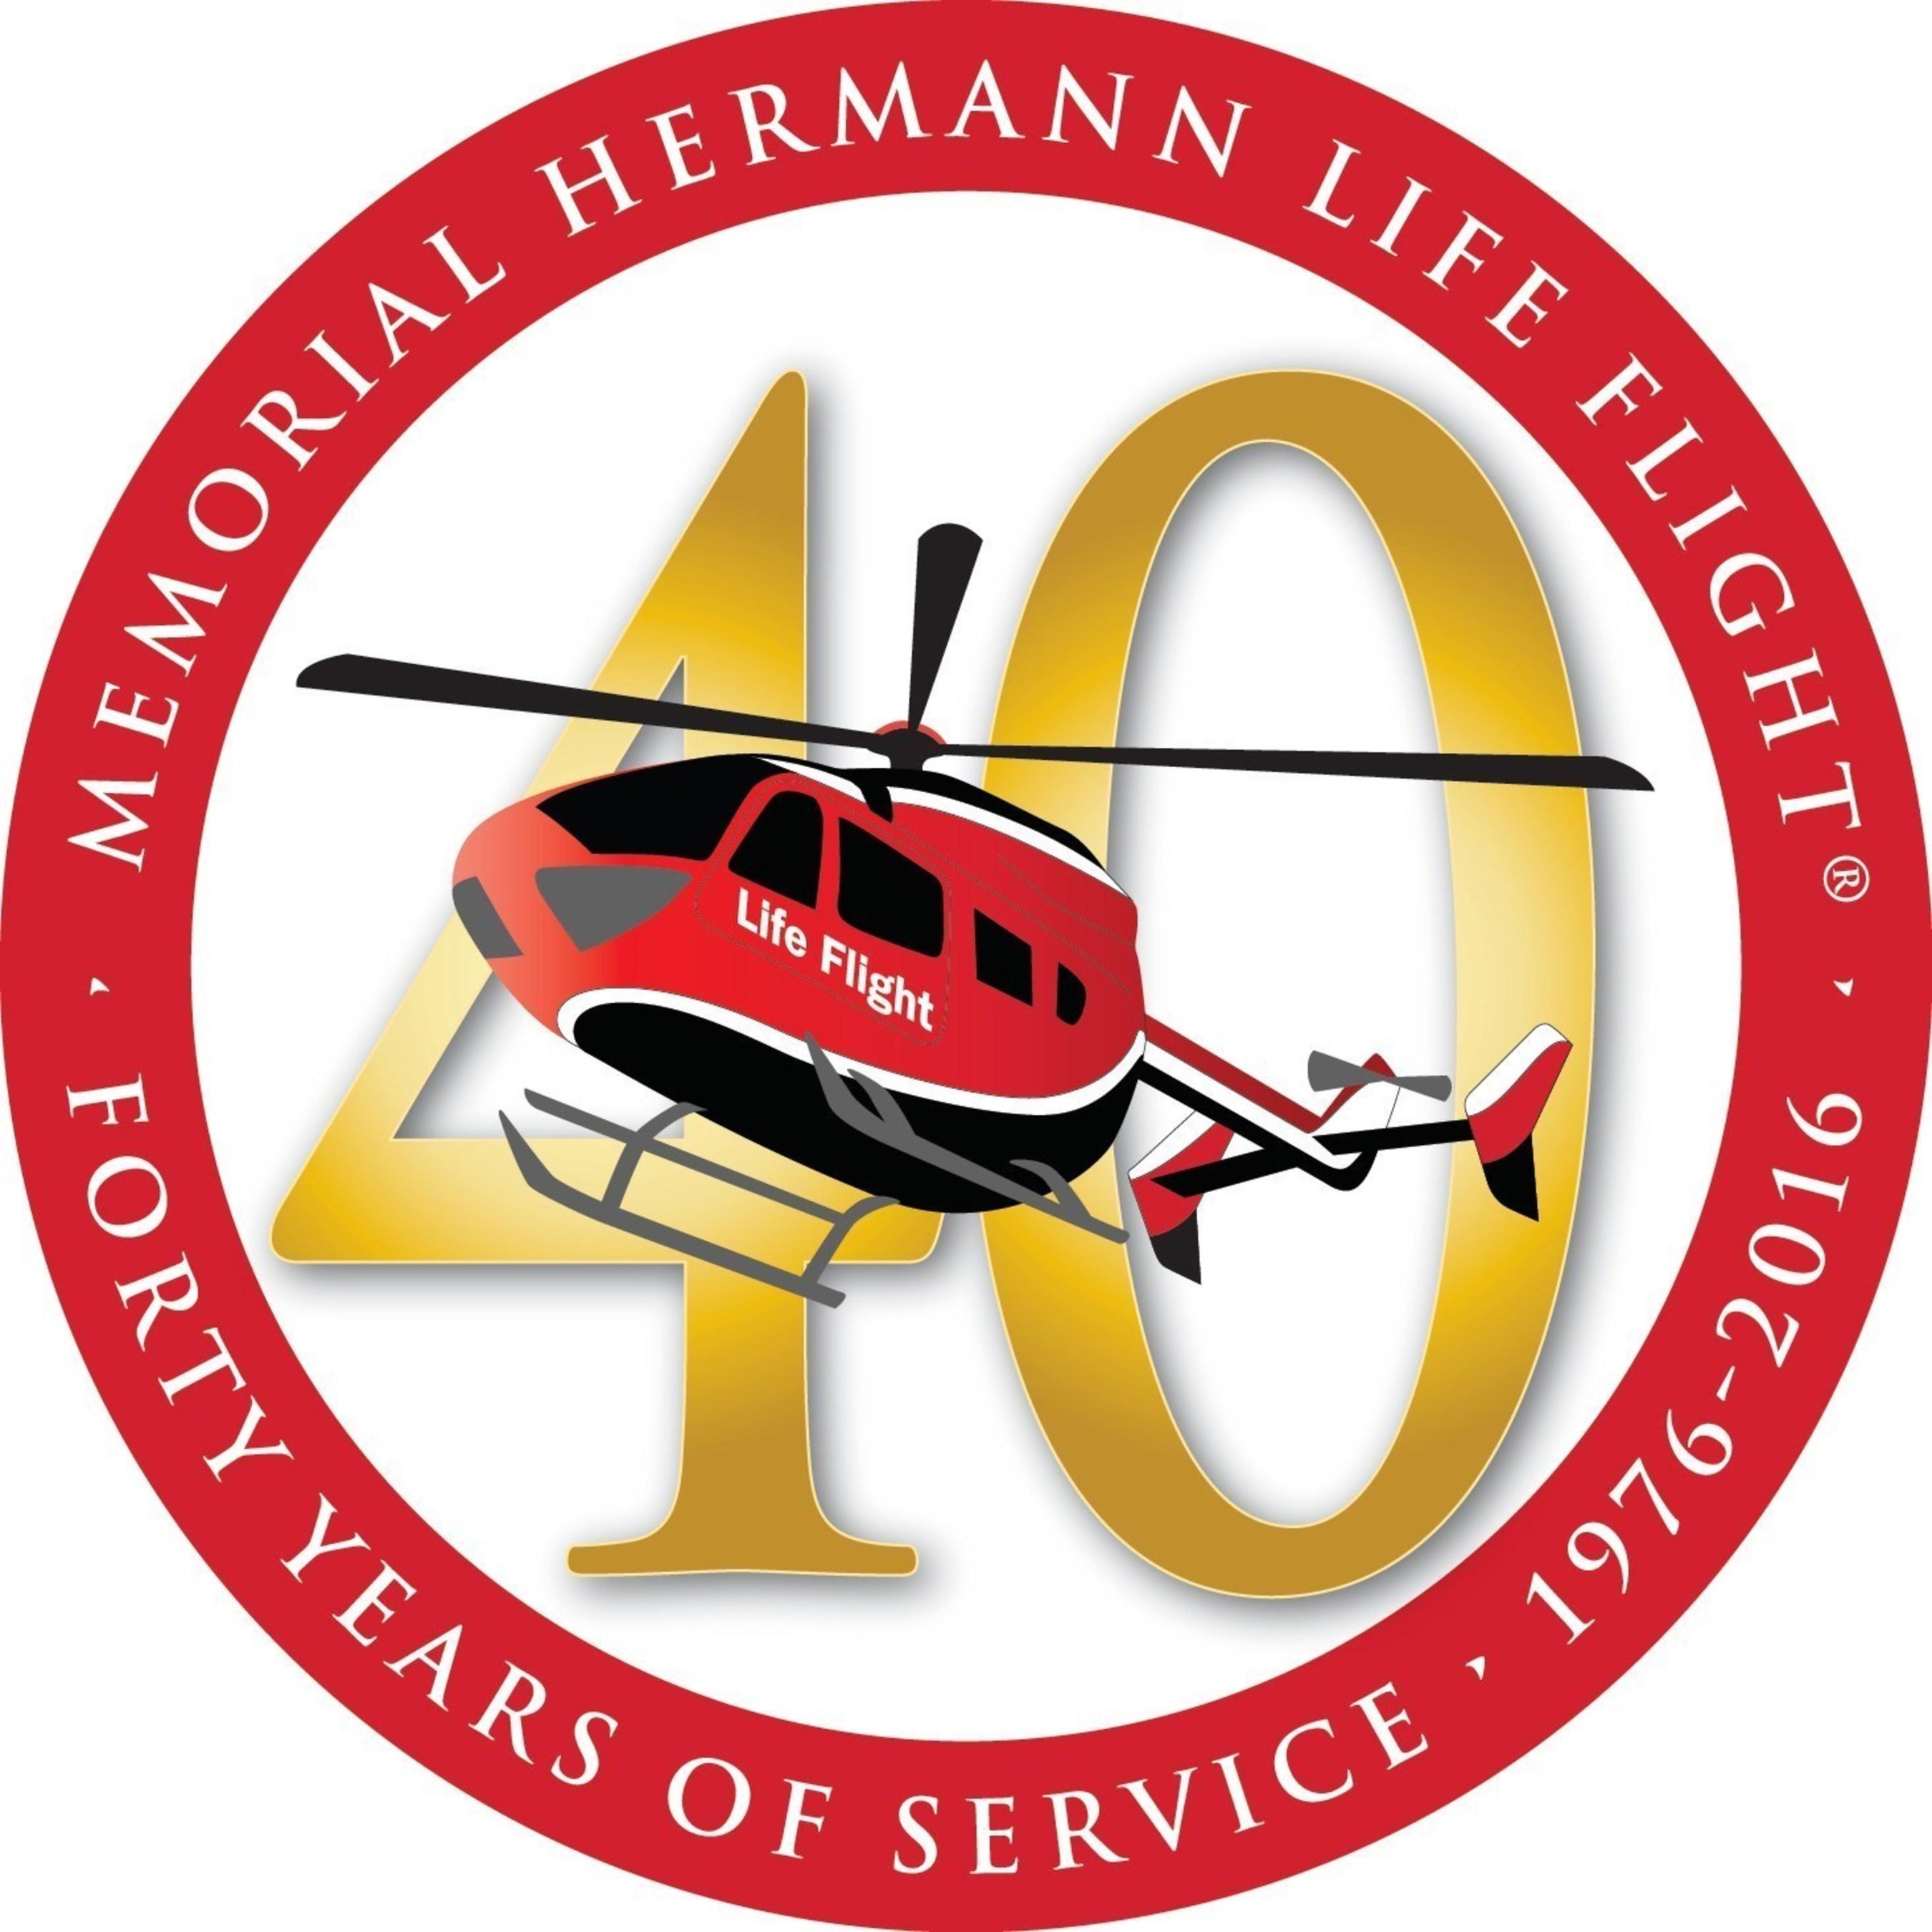 Memorial Hermann Life Flight